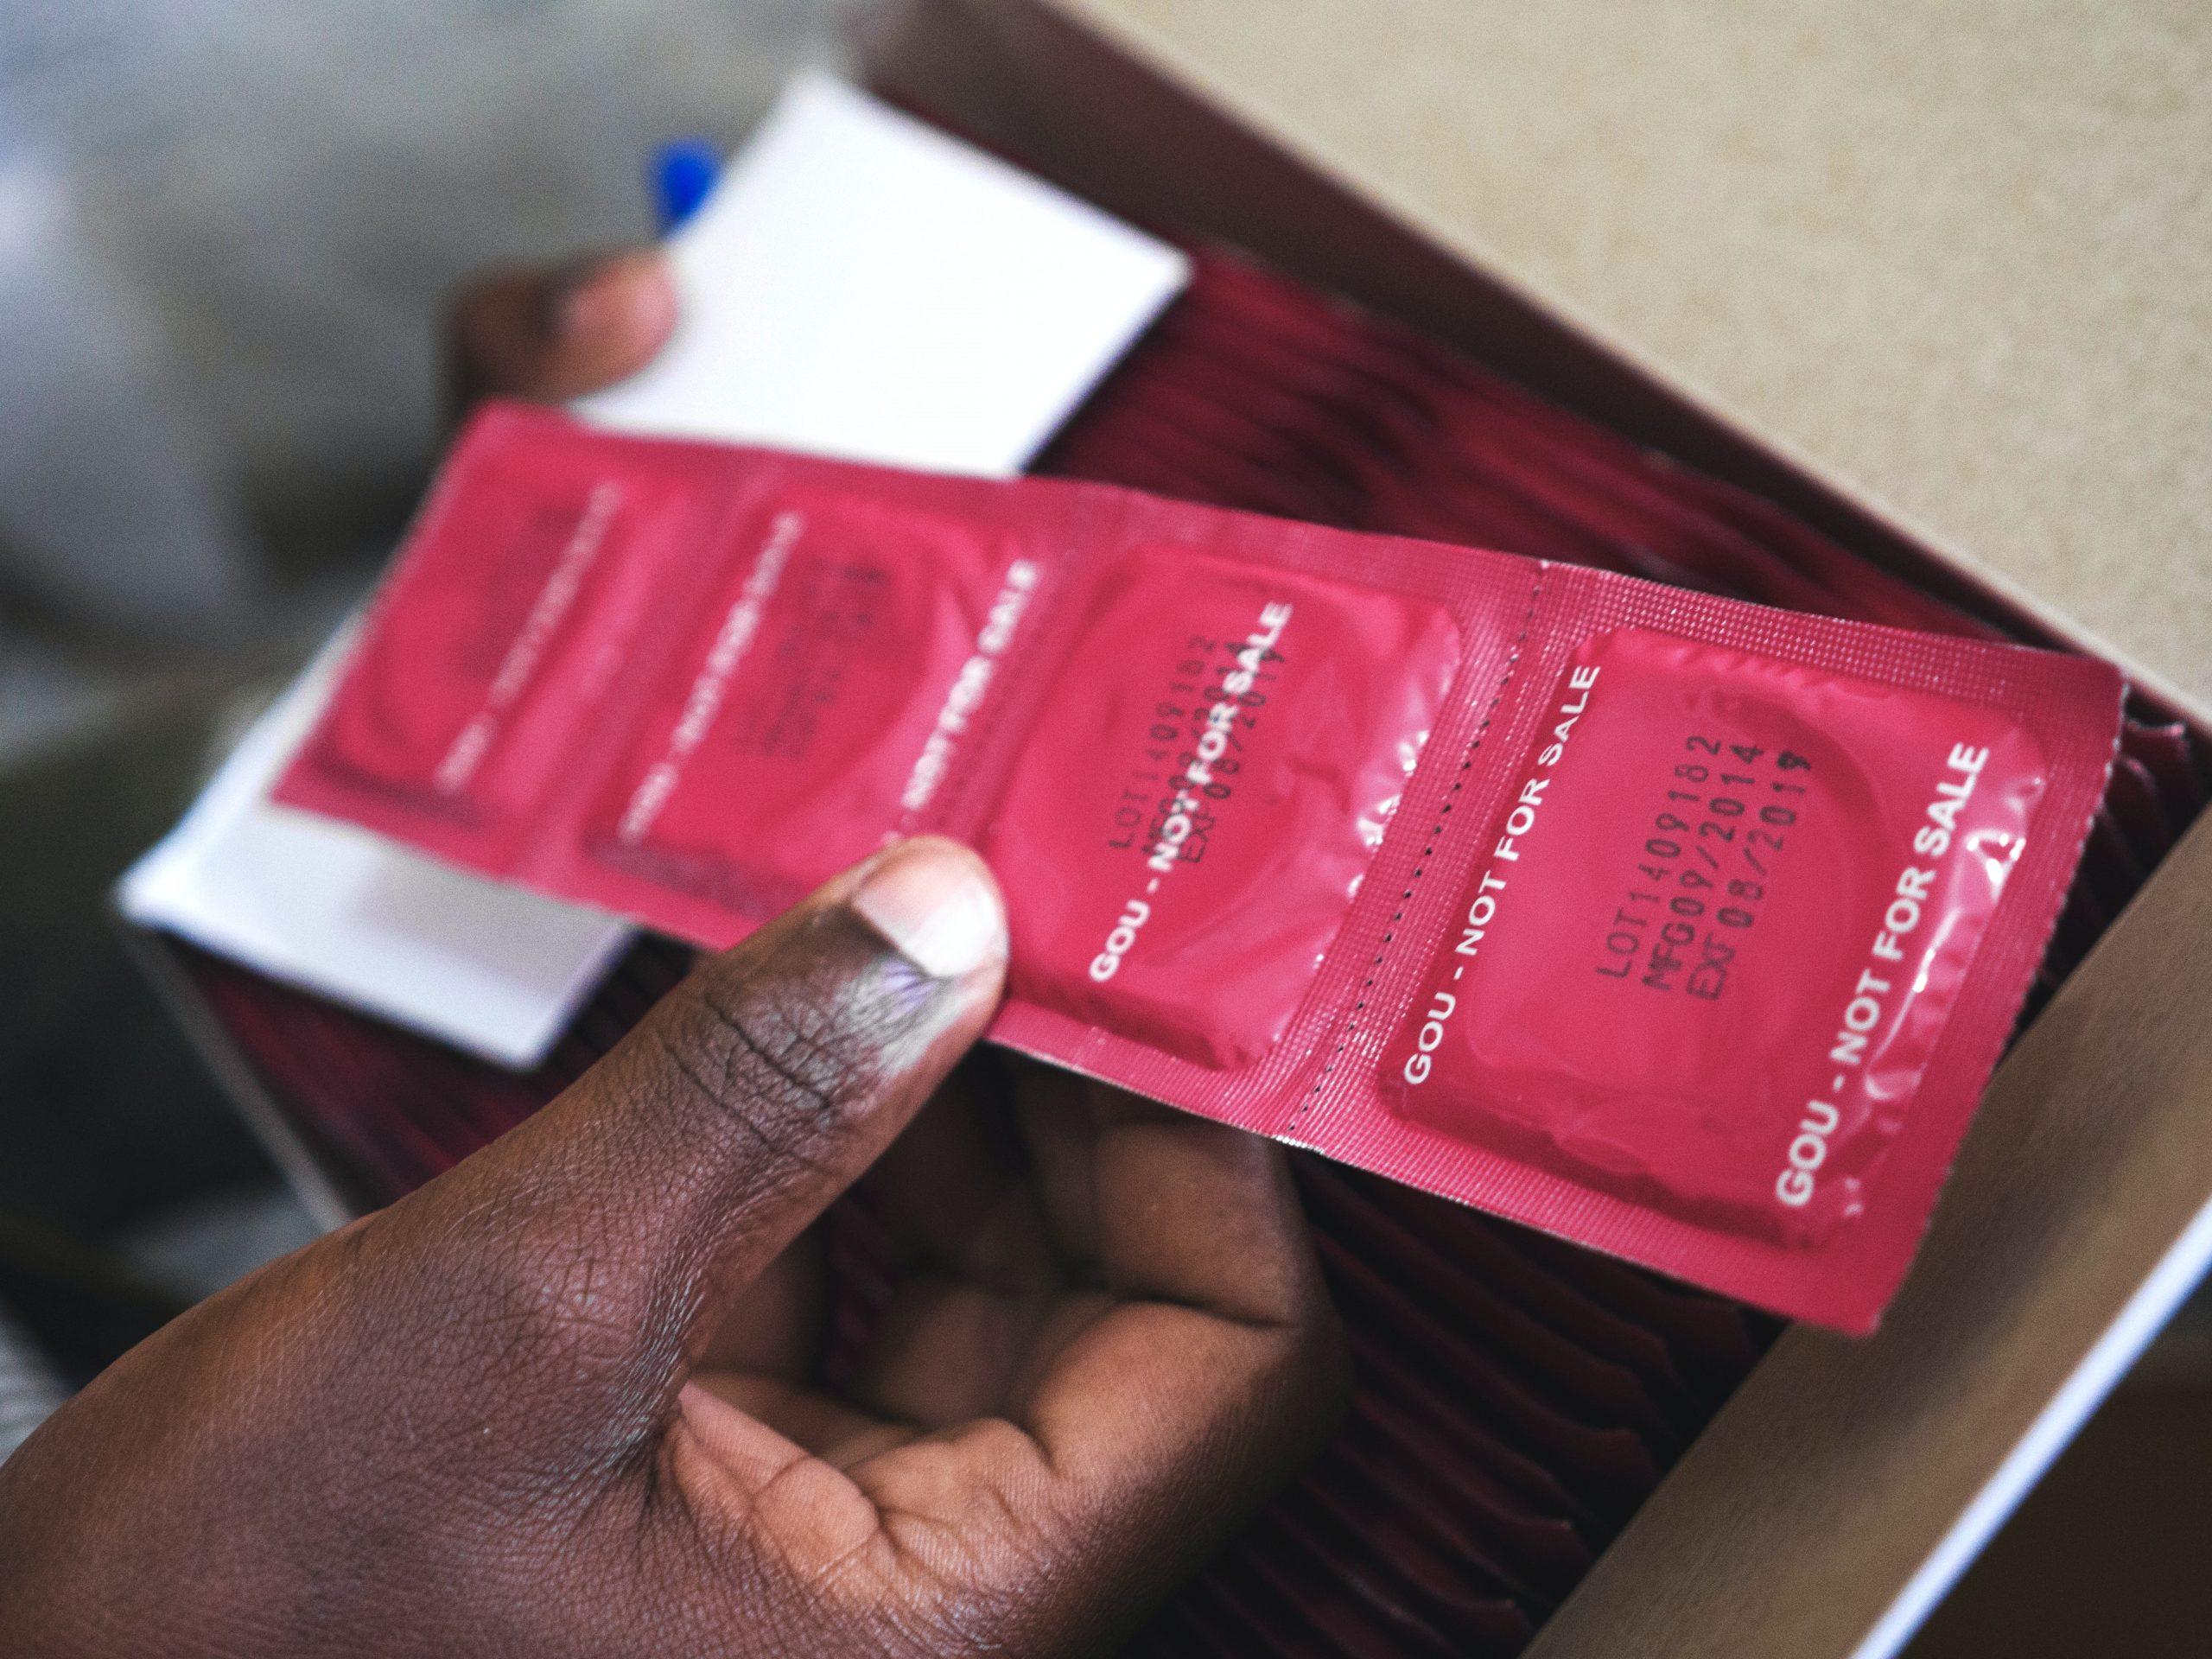 man holding red condom packs